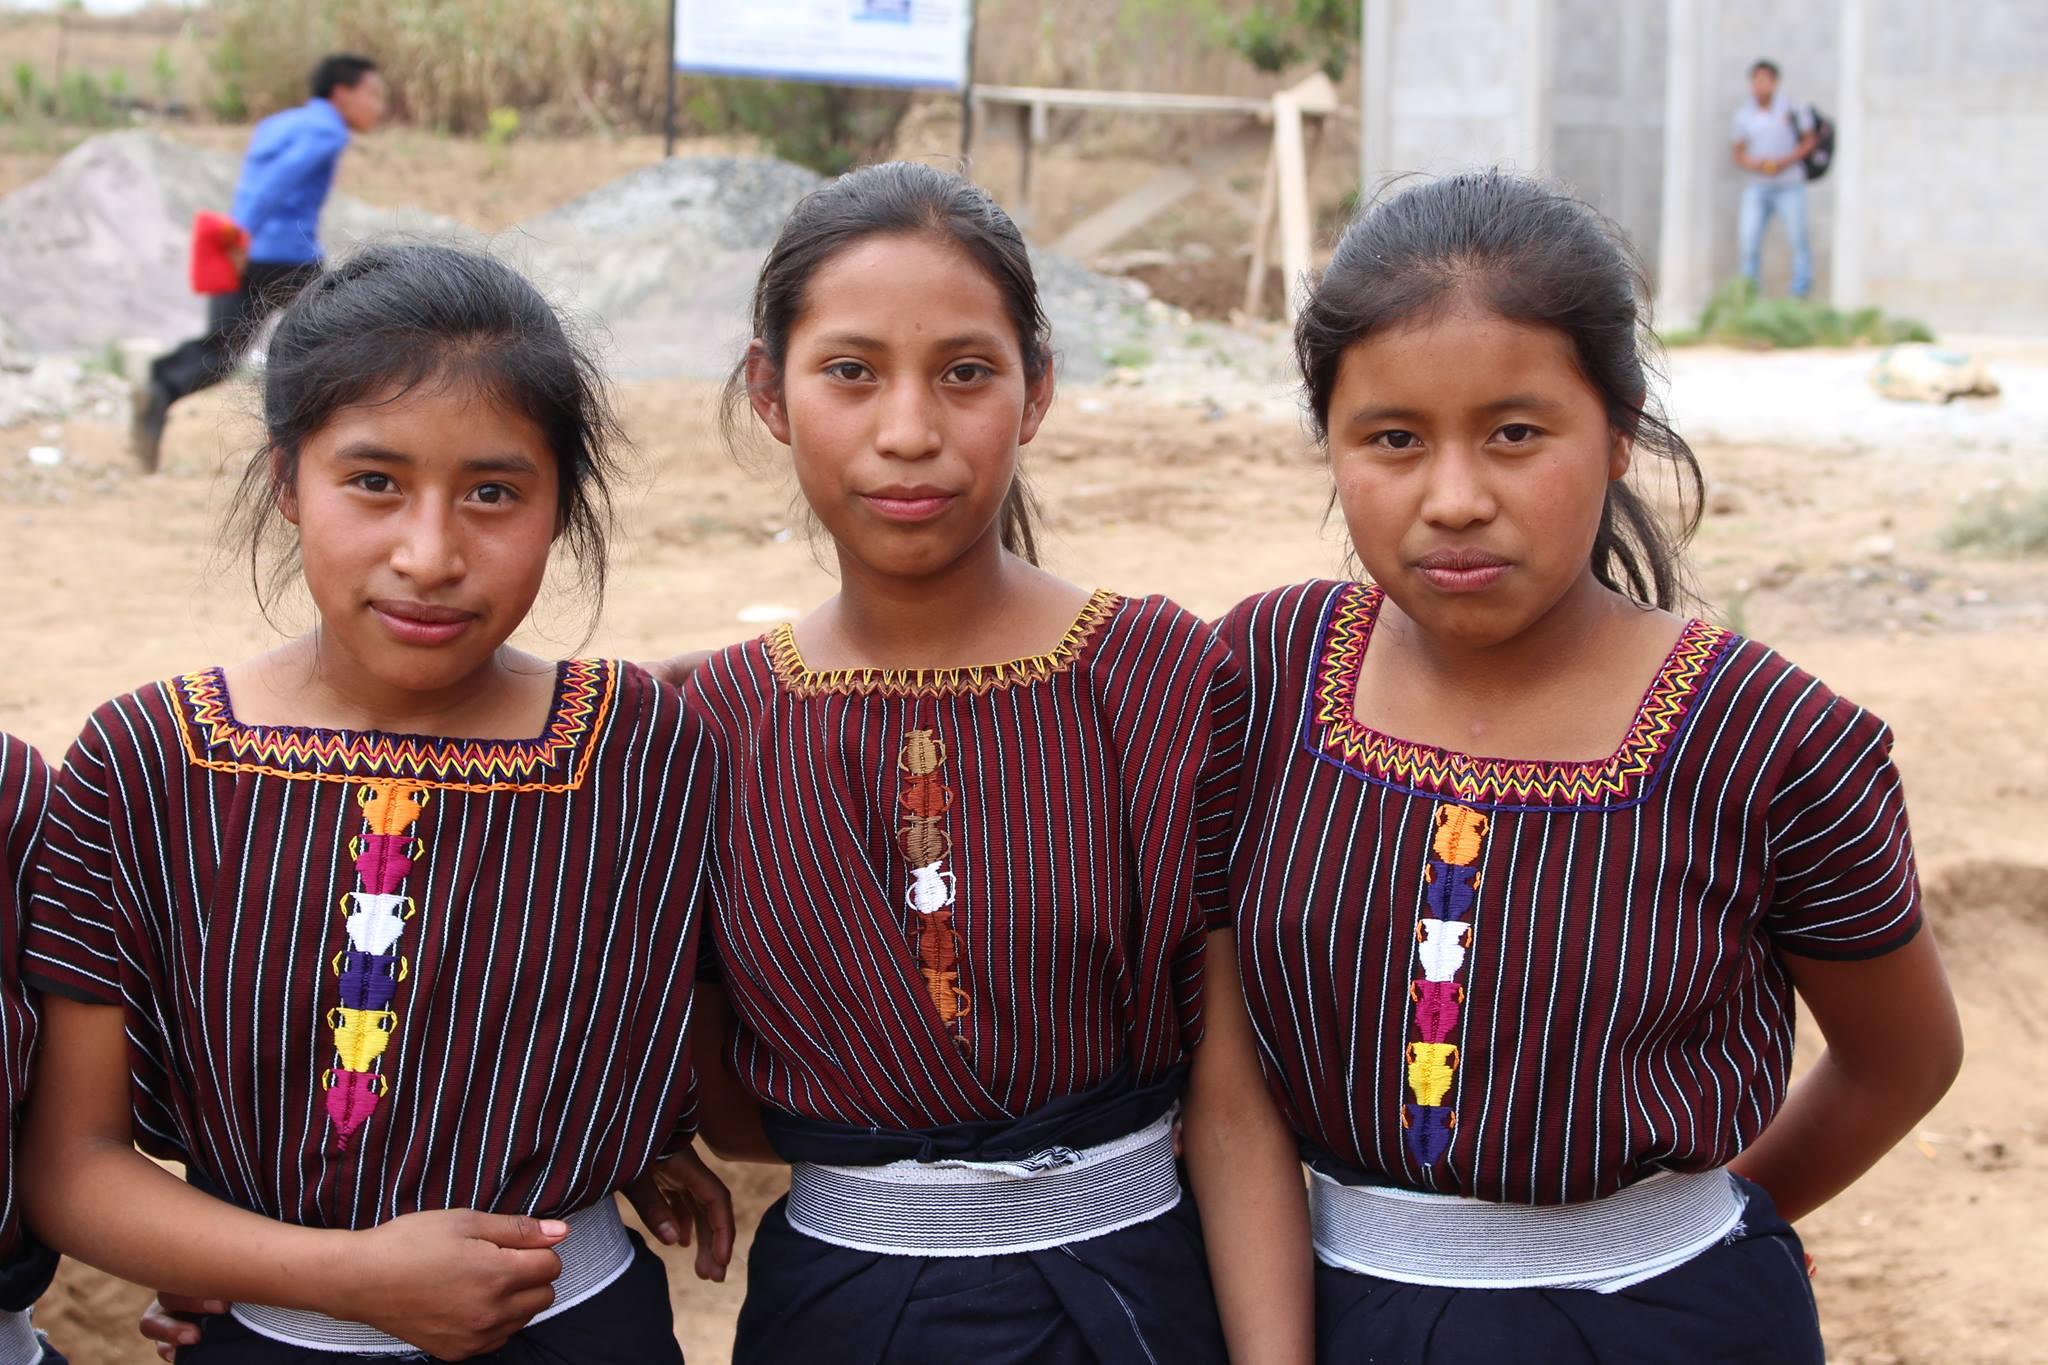 Piger på skolen Building Community